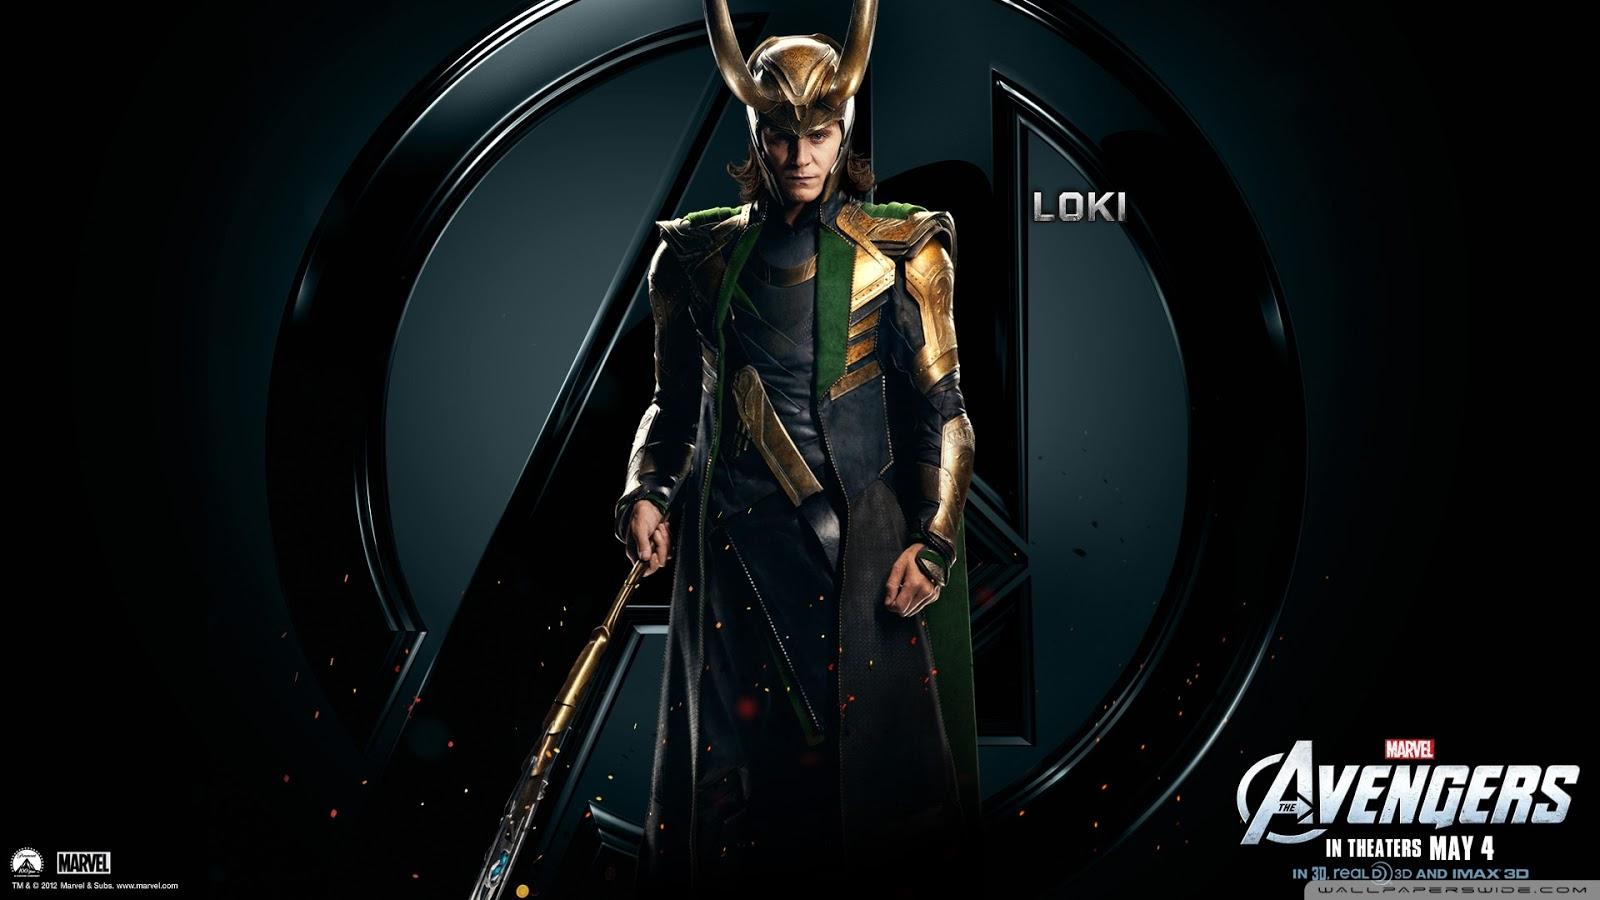 Loki Avengers 4